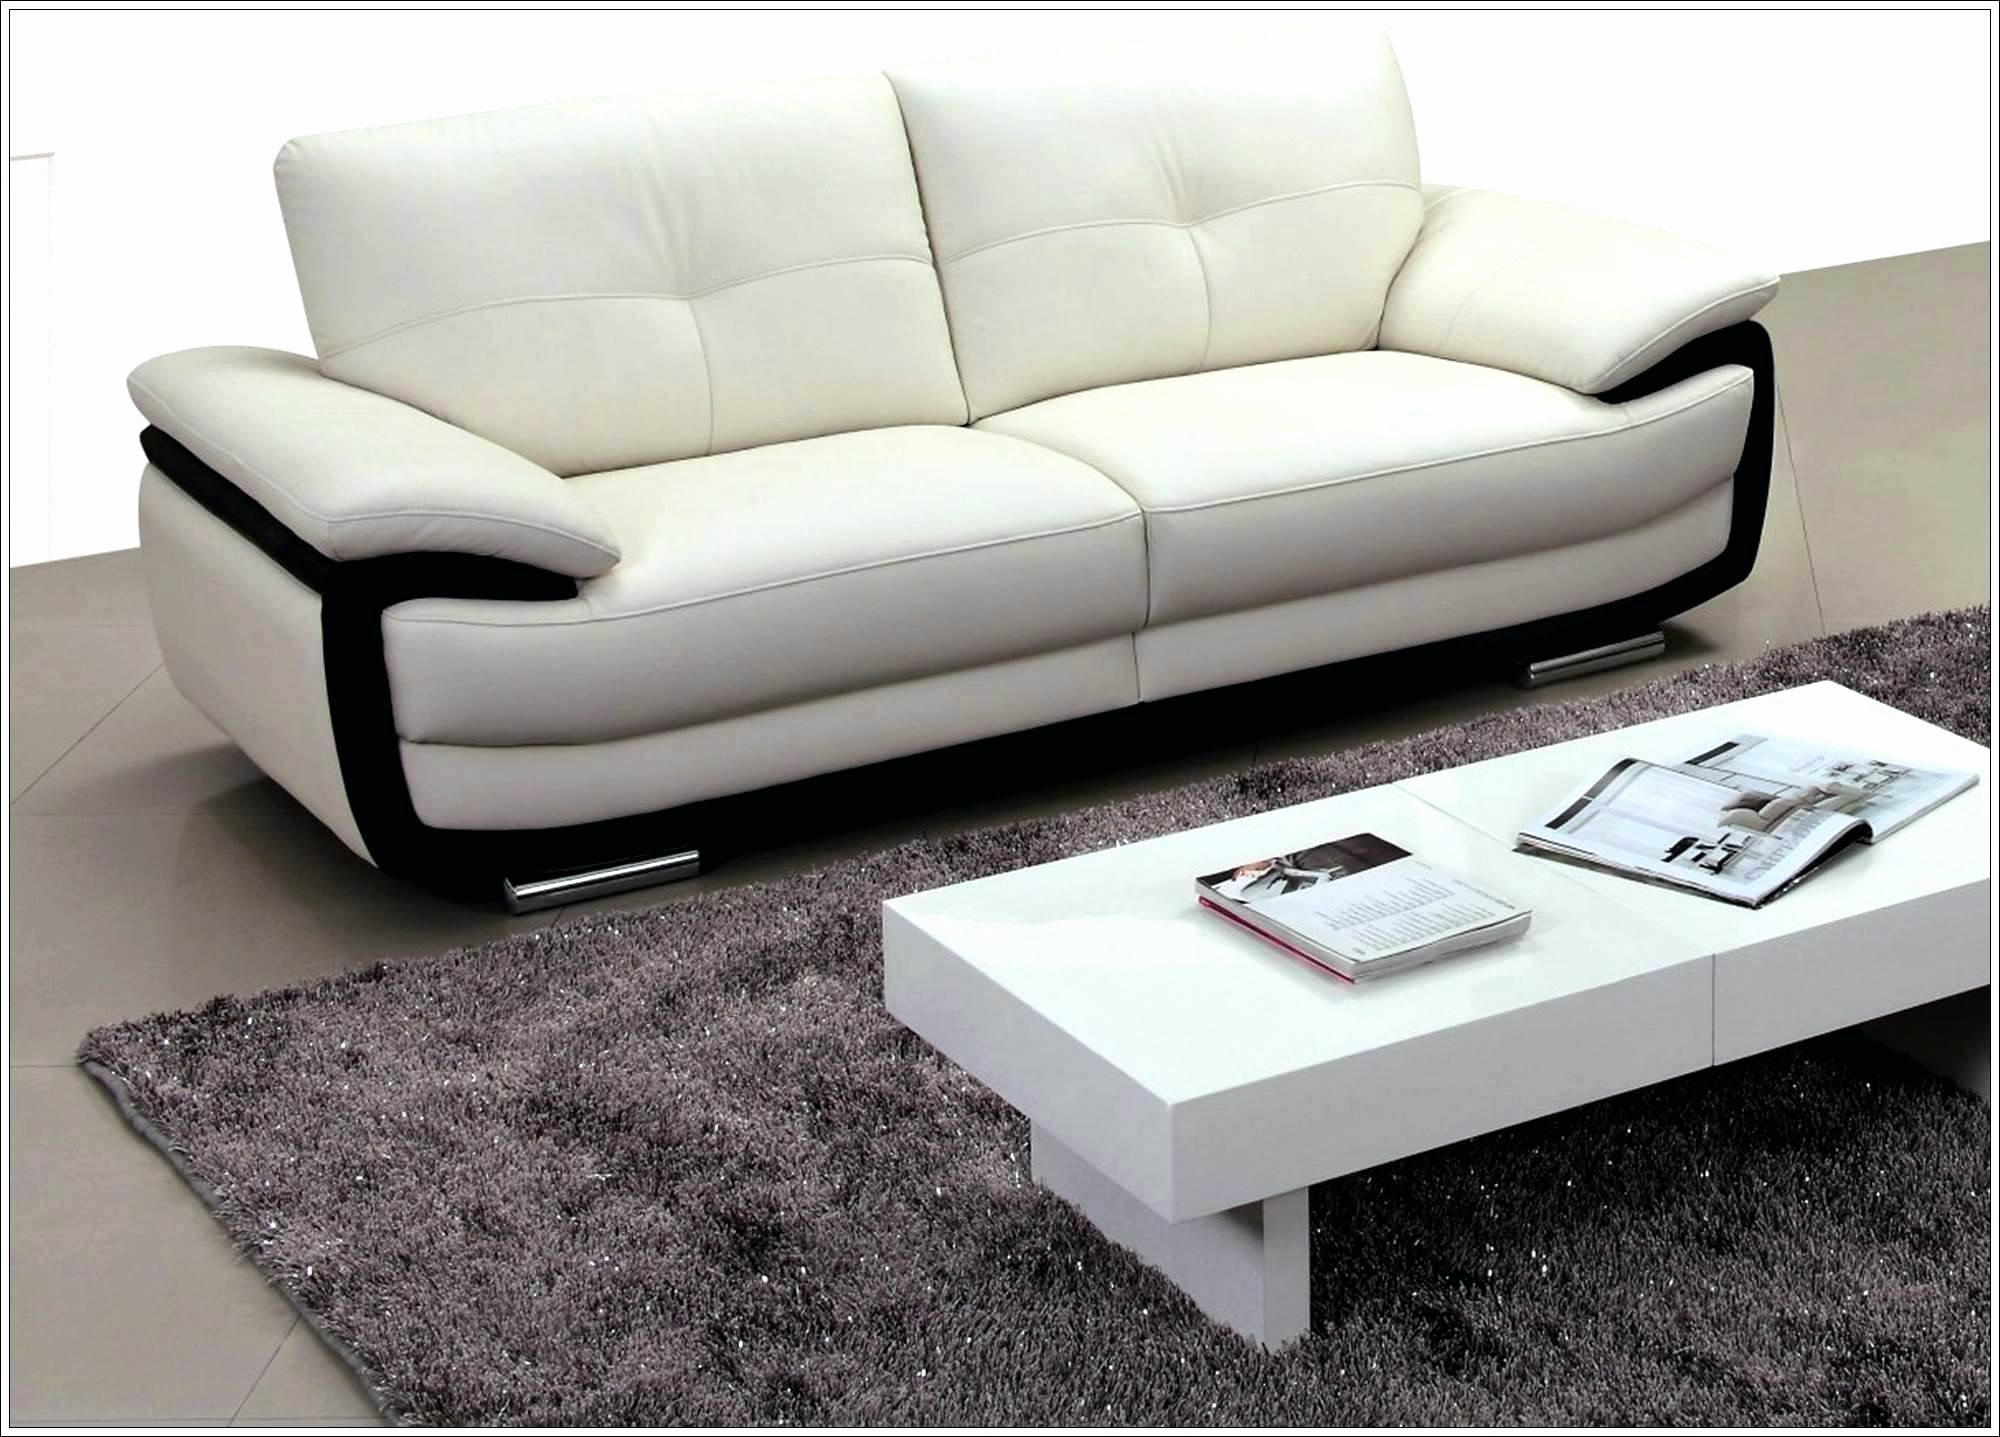 Housse Canapé Convertible 3 Places Luxe Galerie Canap Convertible 3 Places Conforama 11 Lit 2 Pas Cher Ikea but